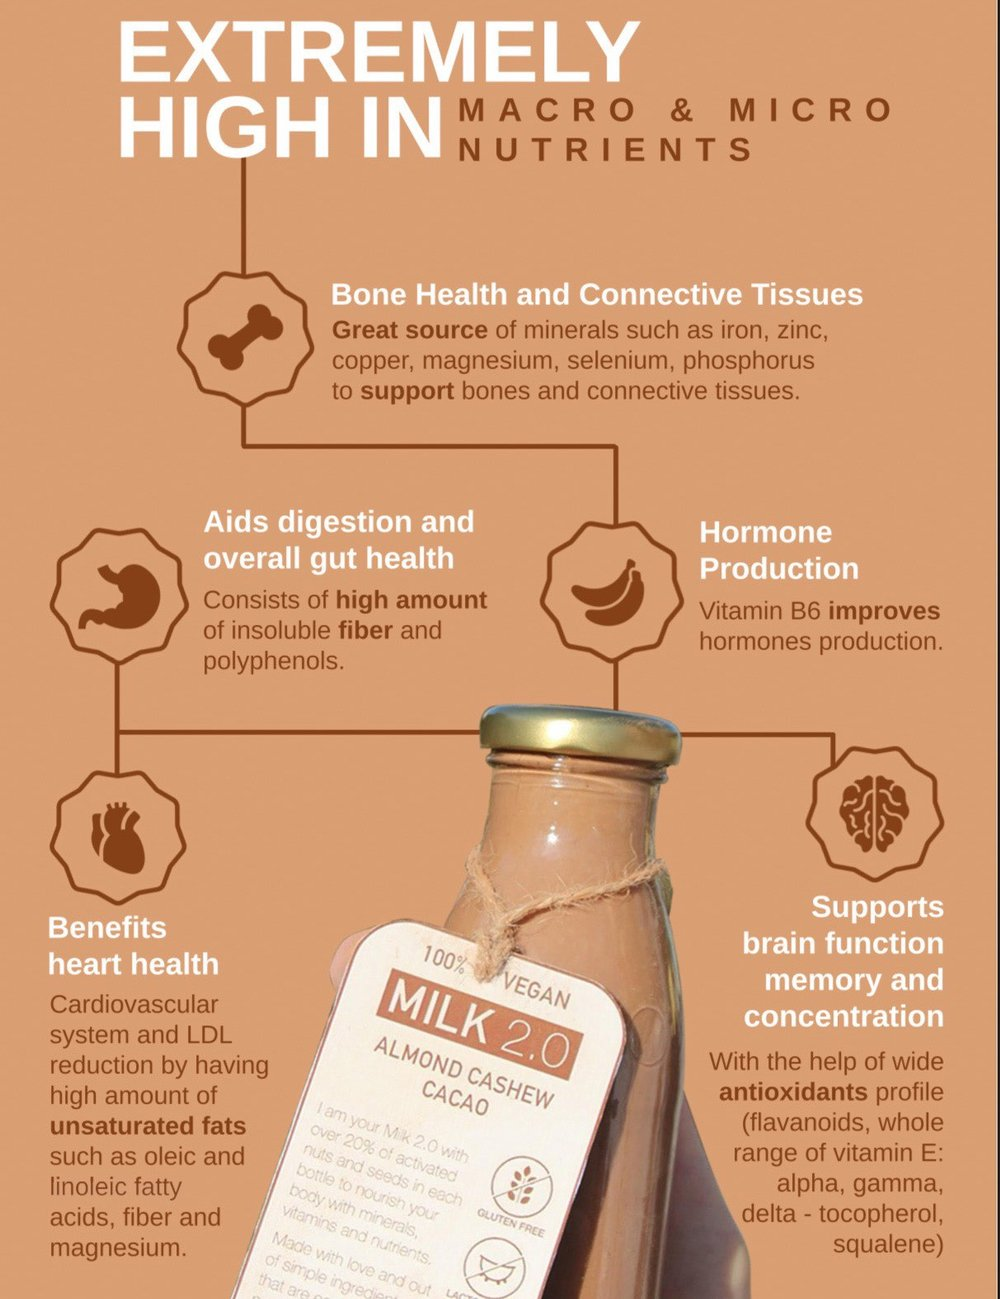 Health benifits Milk 2.0 Almond Cashew milk.jpg